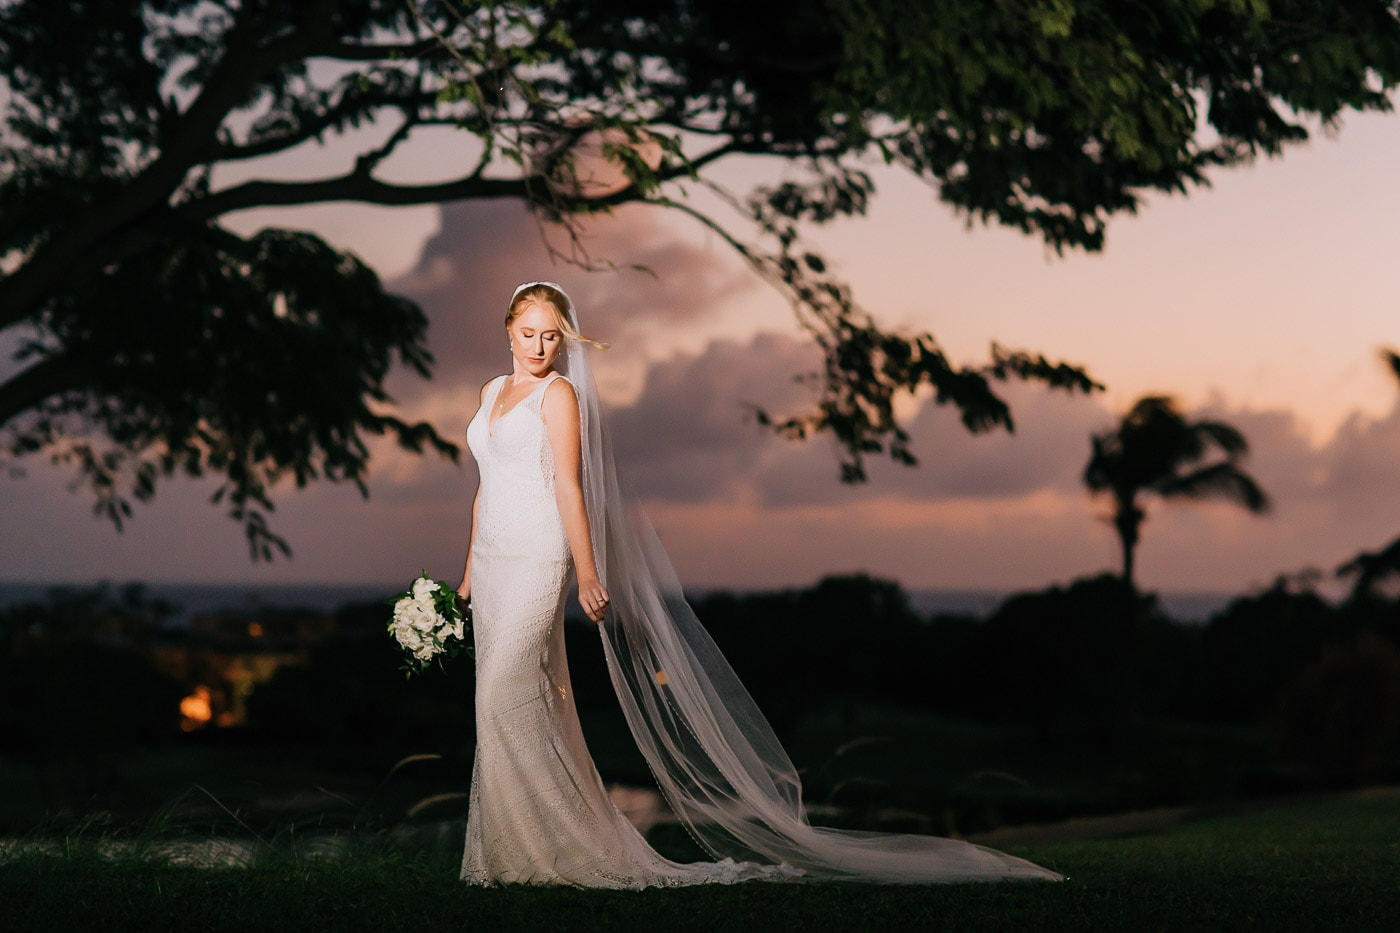 nighttime wedding ceremony